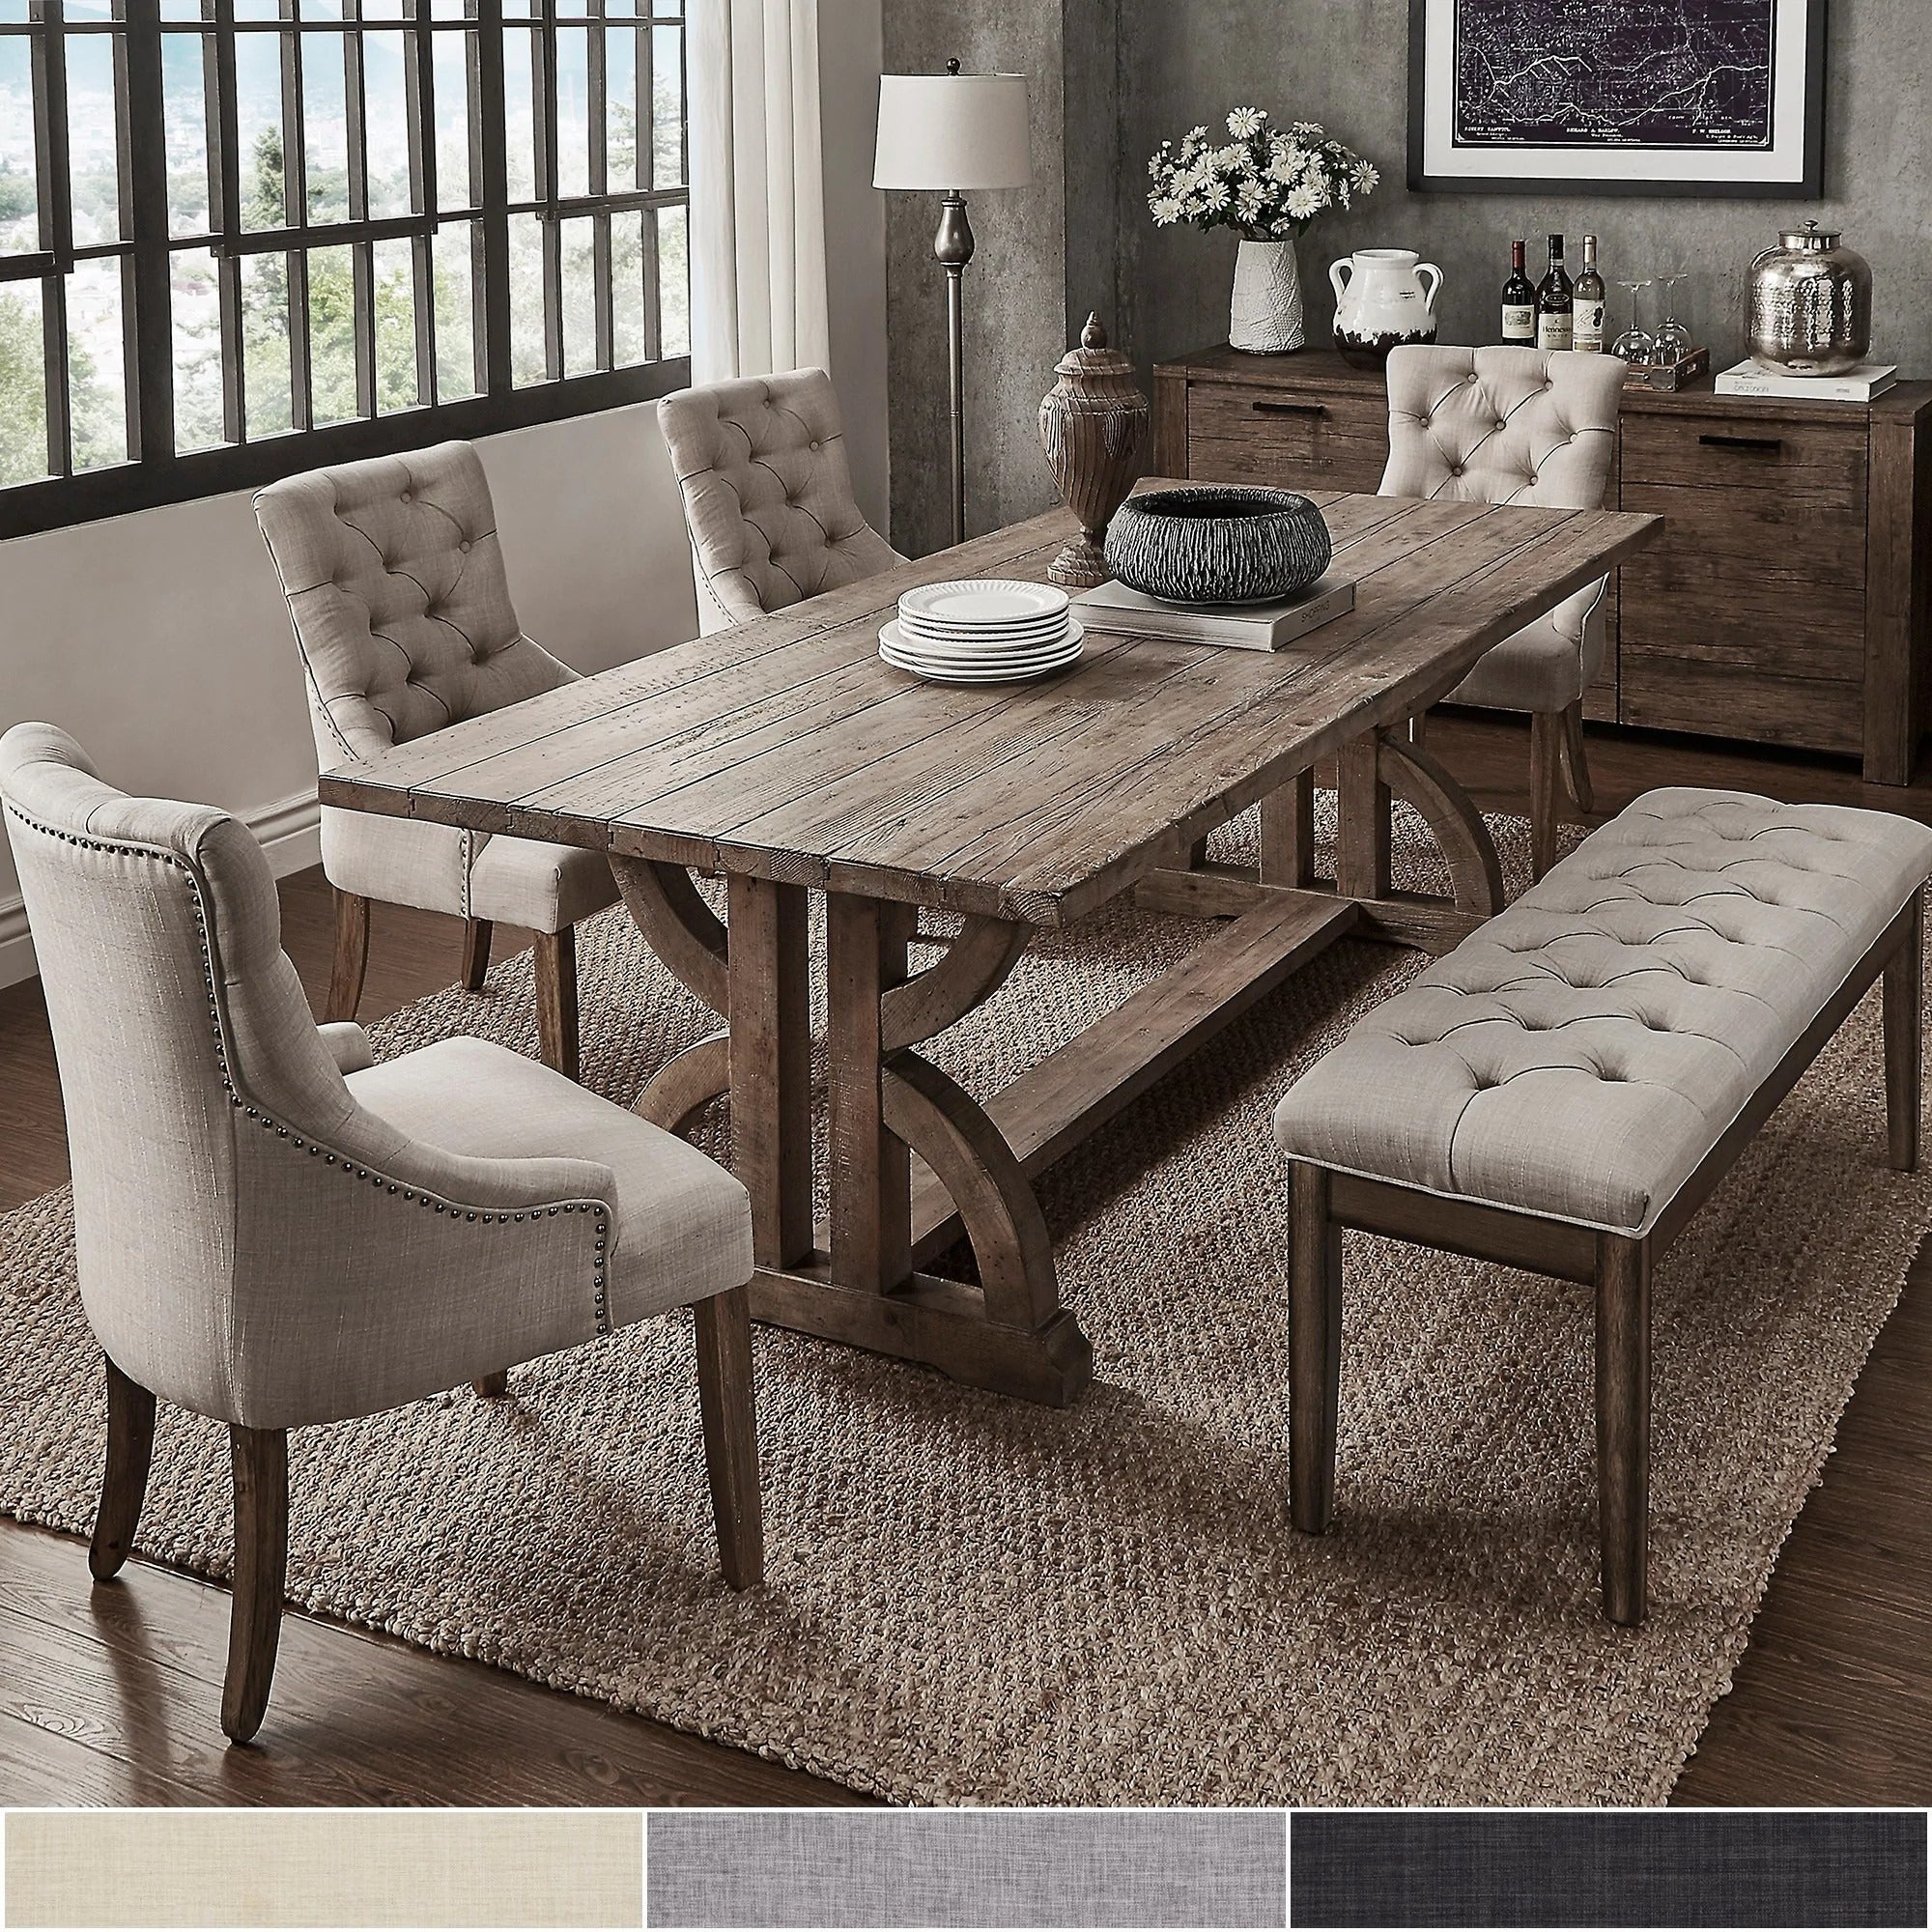 buy kitchen dining room sets online at overstock com our best rh overstock com upholstered dining room chairs overstock dining room chairs overstock